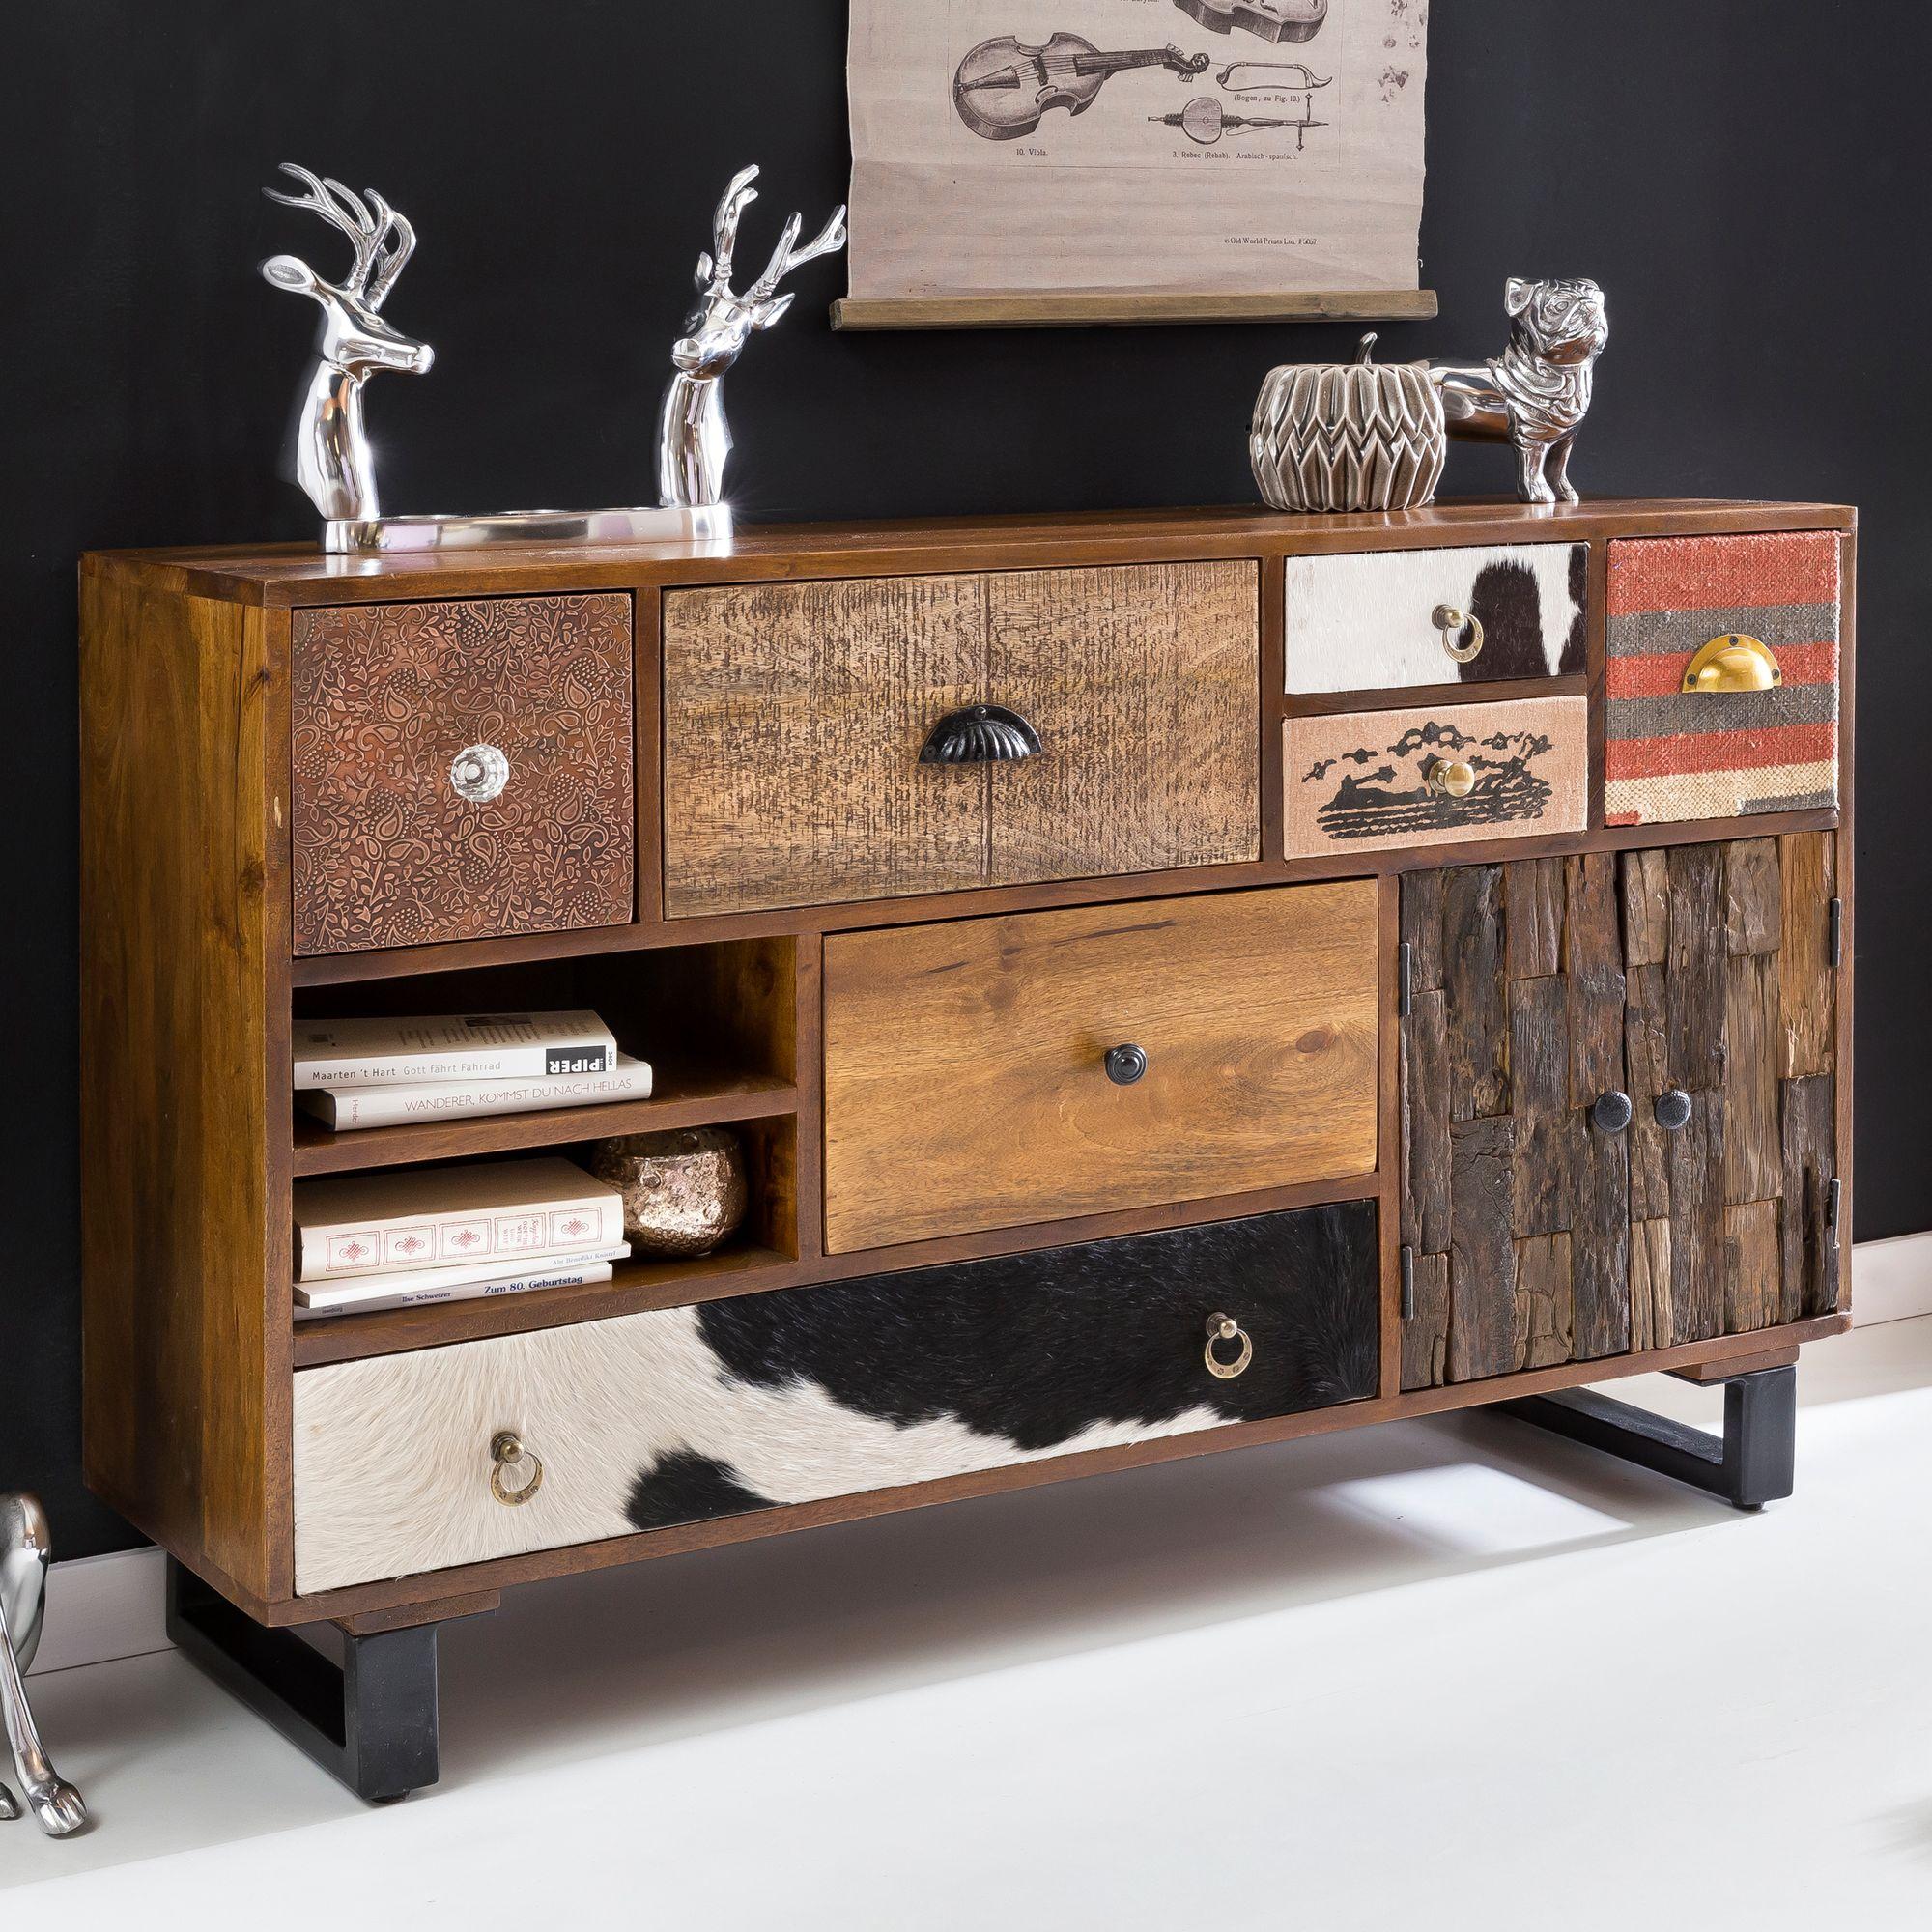 Finebuy Sideboard Kanpur 120 Cm Schublade Holz Kommode Flur Schrank